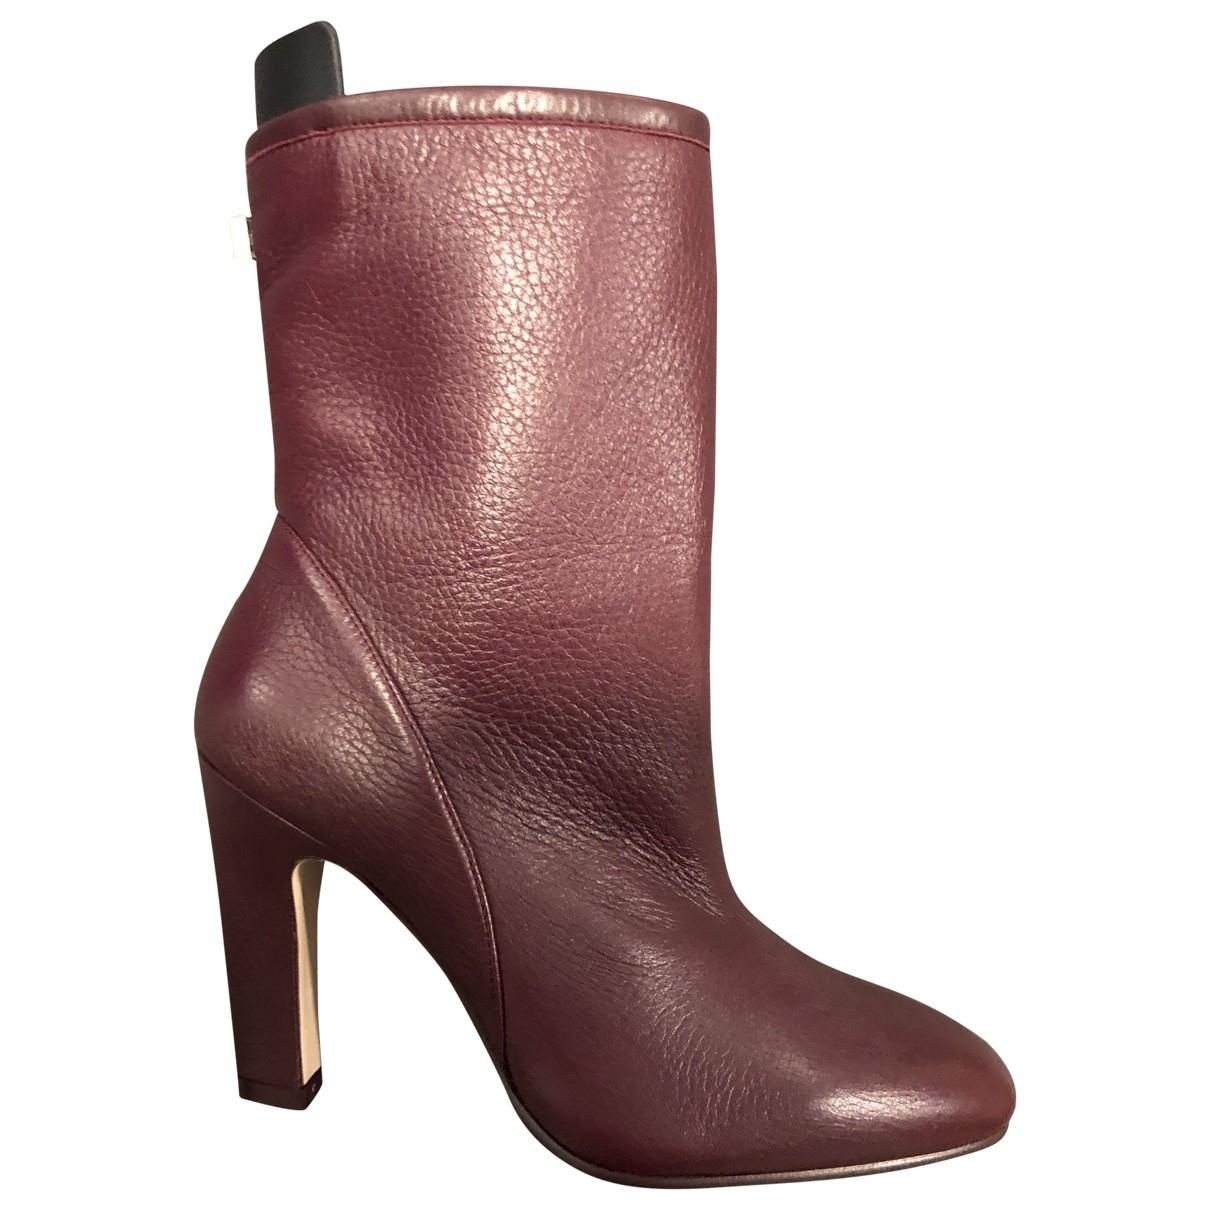 Stuart Weitzman \N Burgundy Leather Ankle boots for Women 37.5 EU